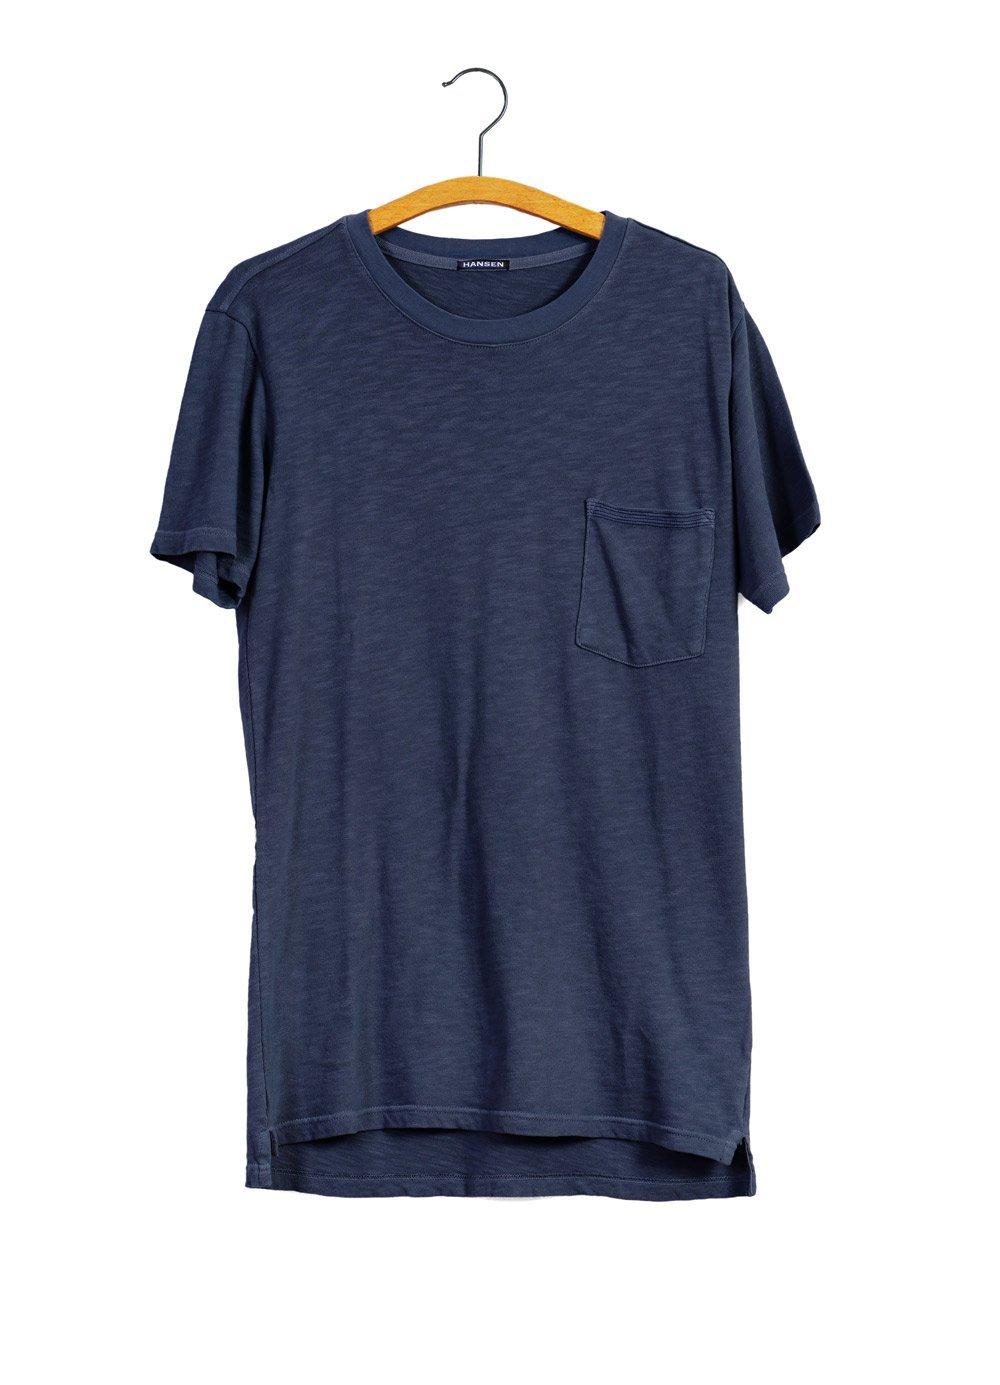 Hansen Garments JAMES   Slub Yarn Pocket T   var. colors